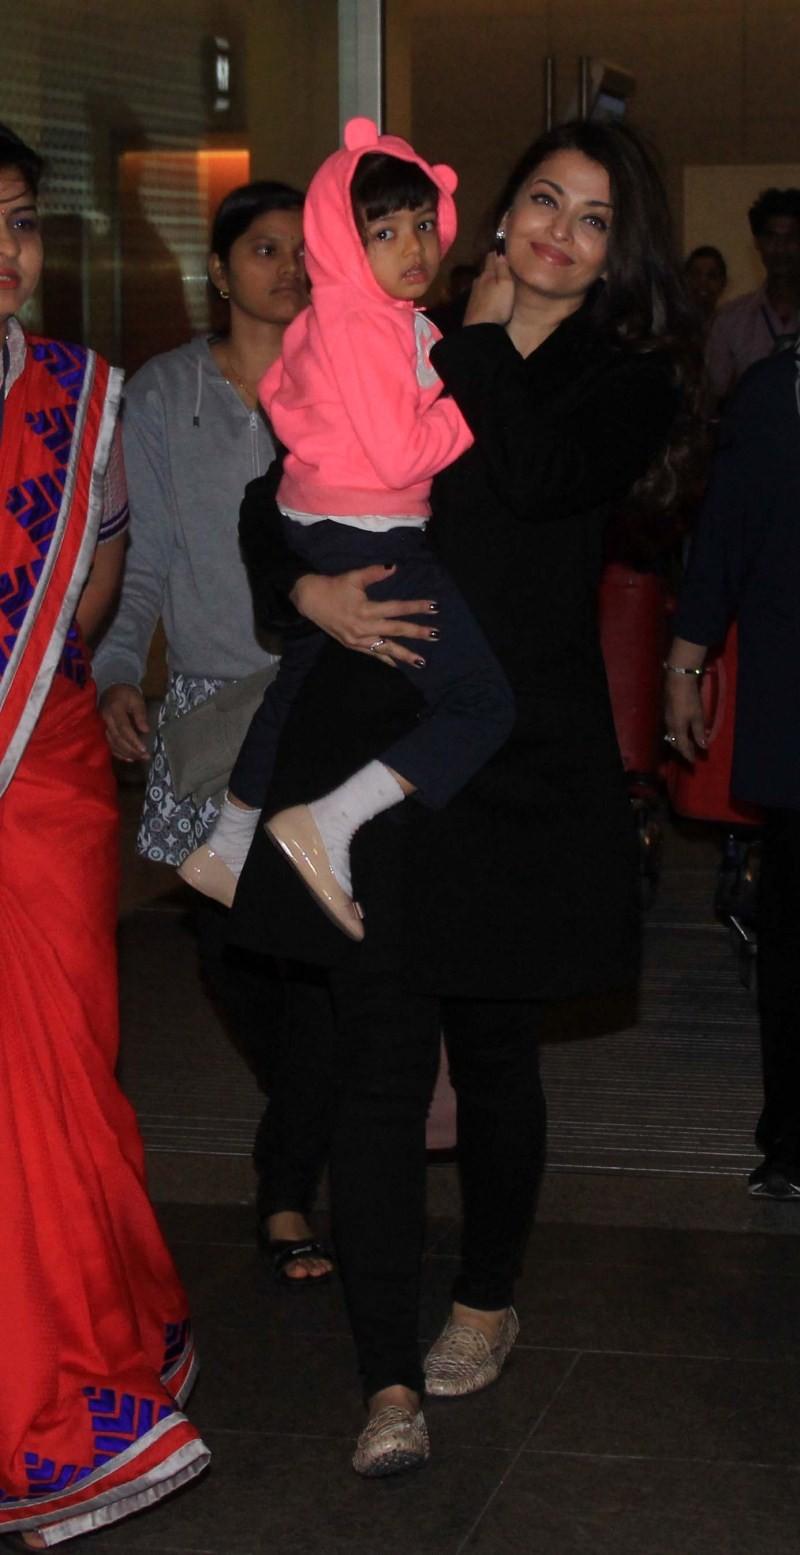 Aishwarya Rai returns from Cannes Film Festival,Aishwarya Rai returns from Cannes,Aishwarya Rai,Aishwarya rai Bachchan,Aishwarya Rai Bachchan Cannes,aishwarya rai with aaradhya,aaradhya,daughter Aaradhya,aaradhya latest pics,Aishwarya Rai pics,Aishwarya R